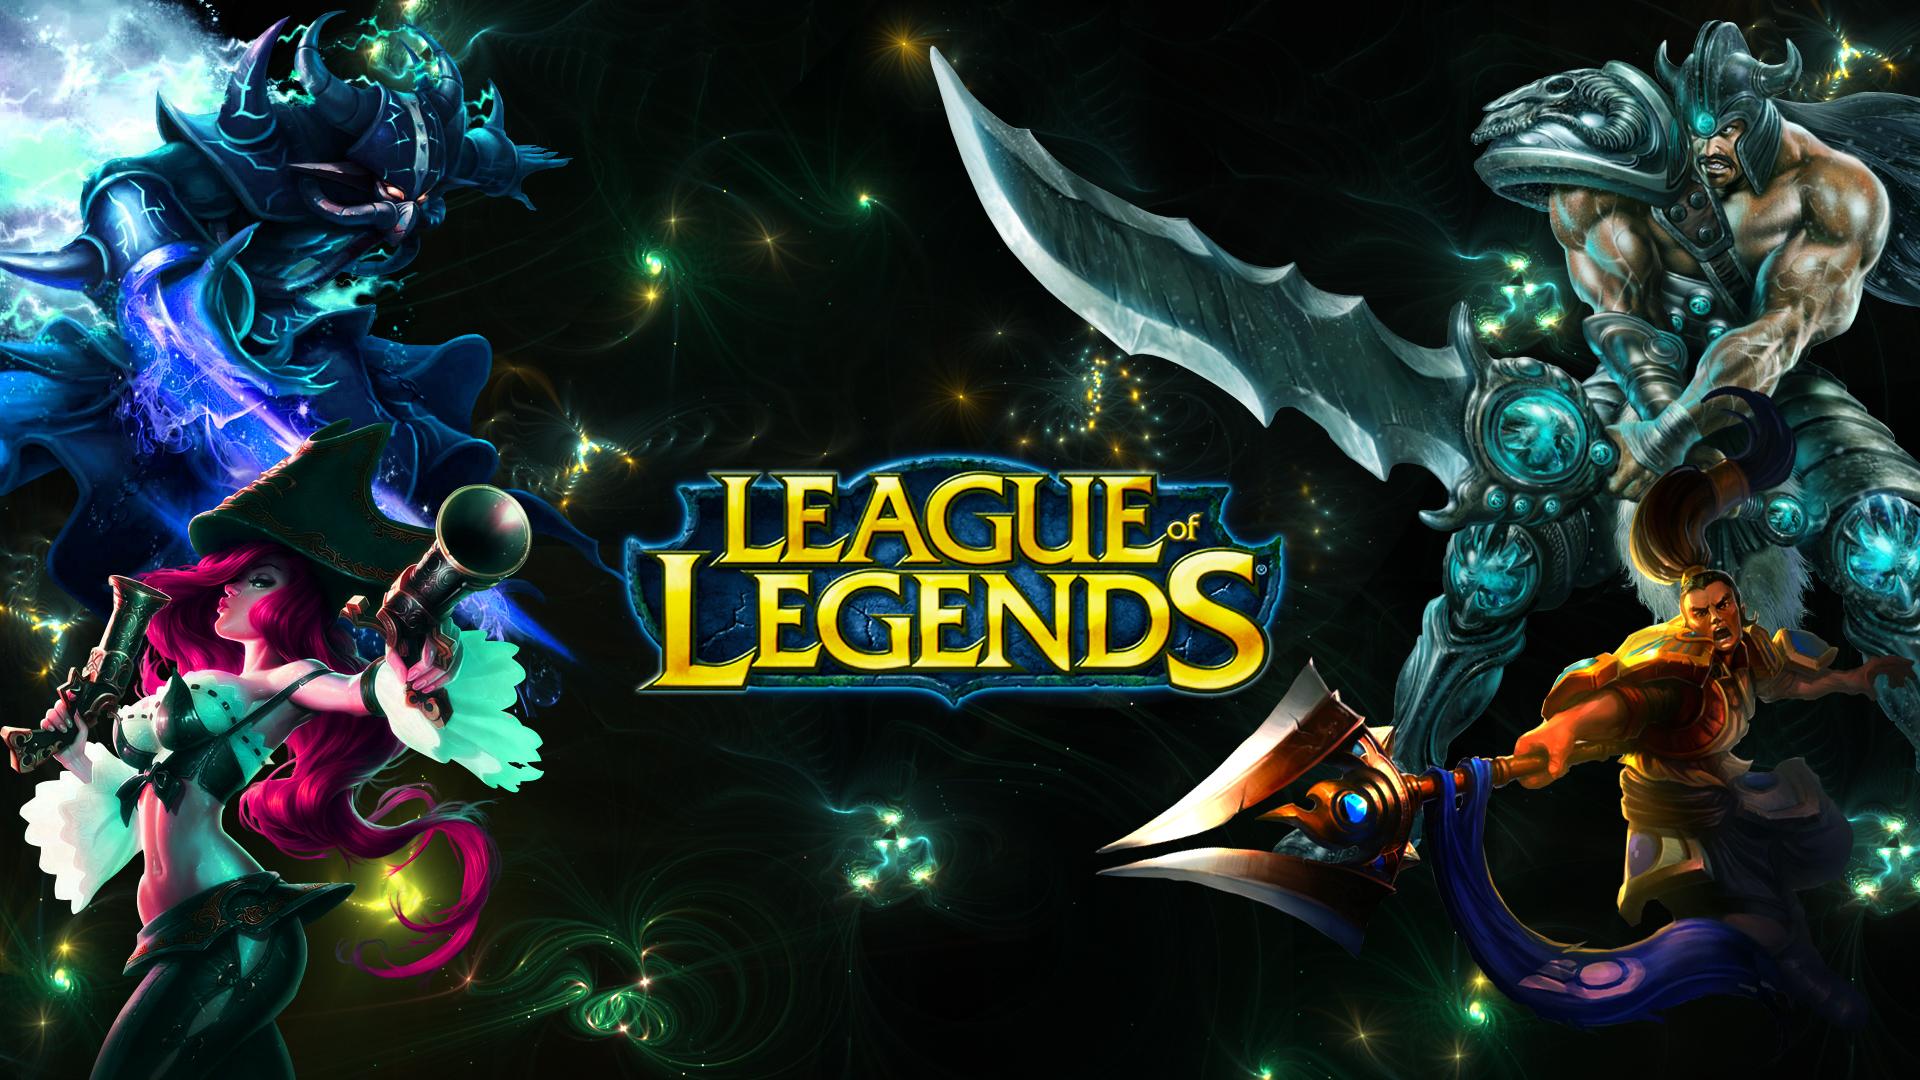 League of Legends wallpaper 111